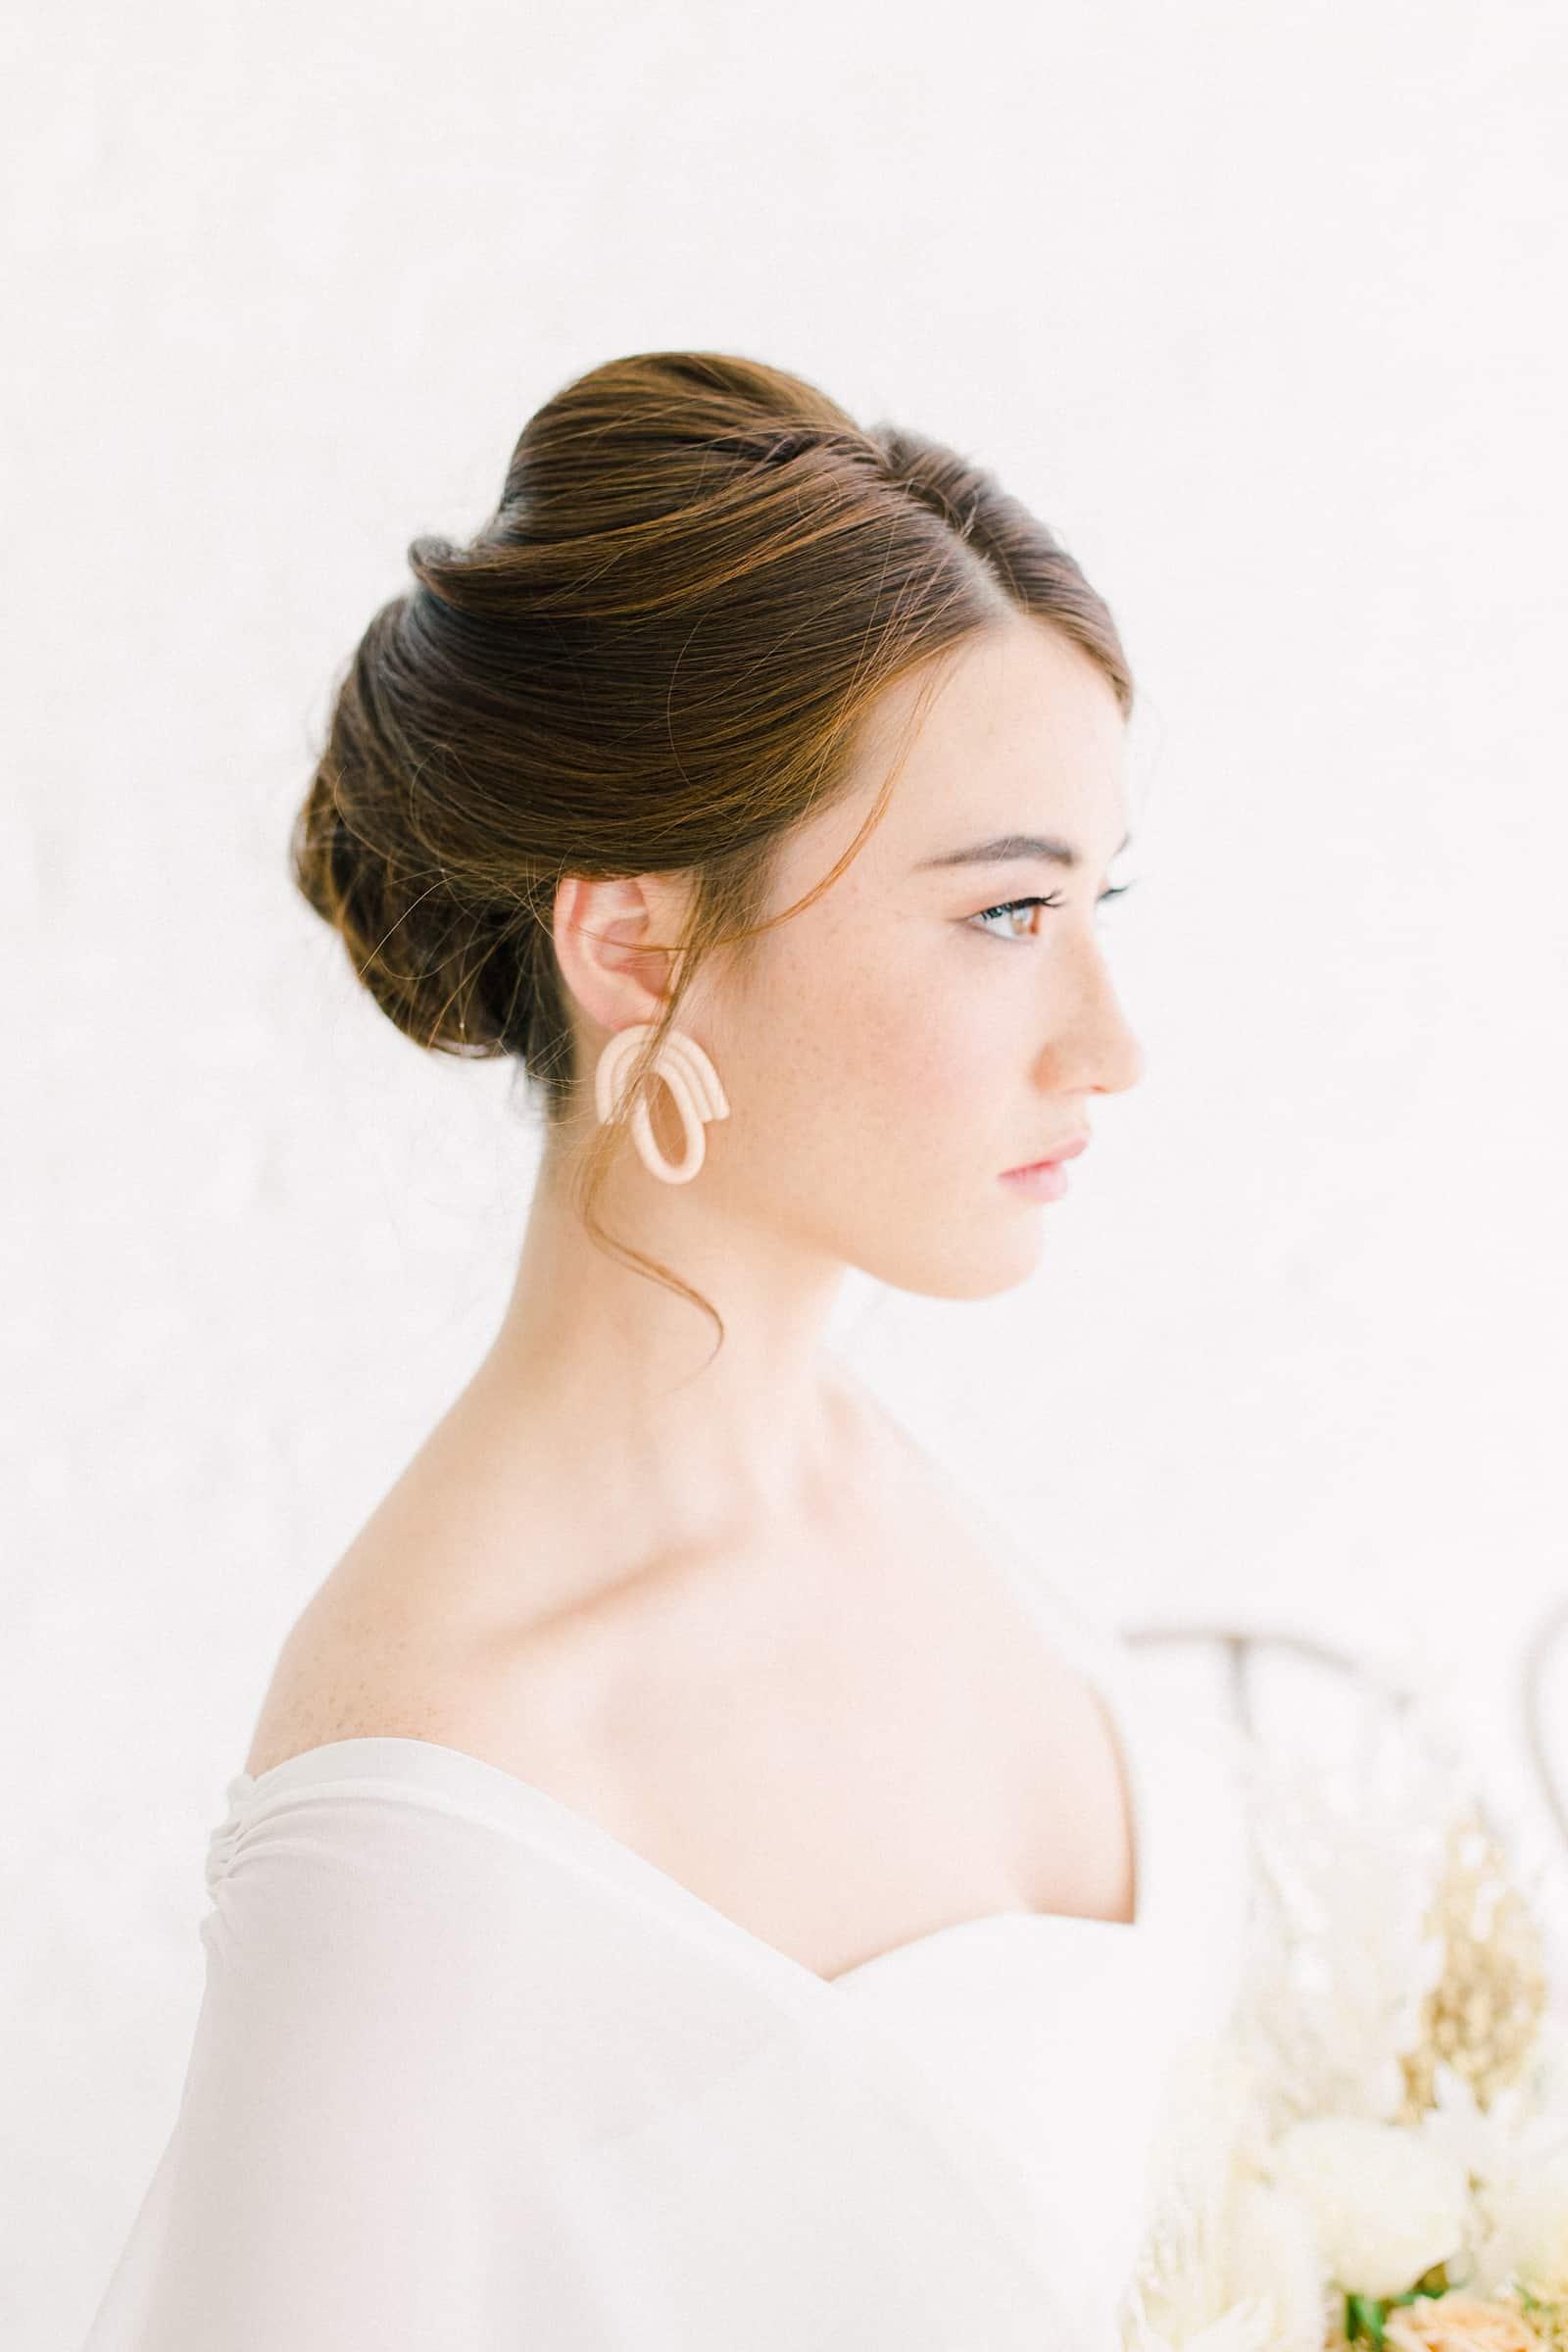 Modern bride with sleep updo, statement earrings and sweetheart neckline